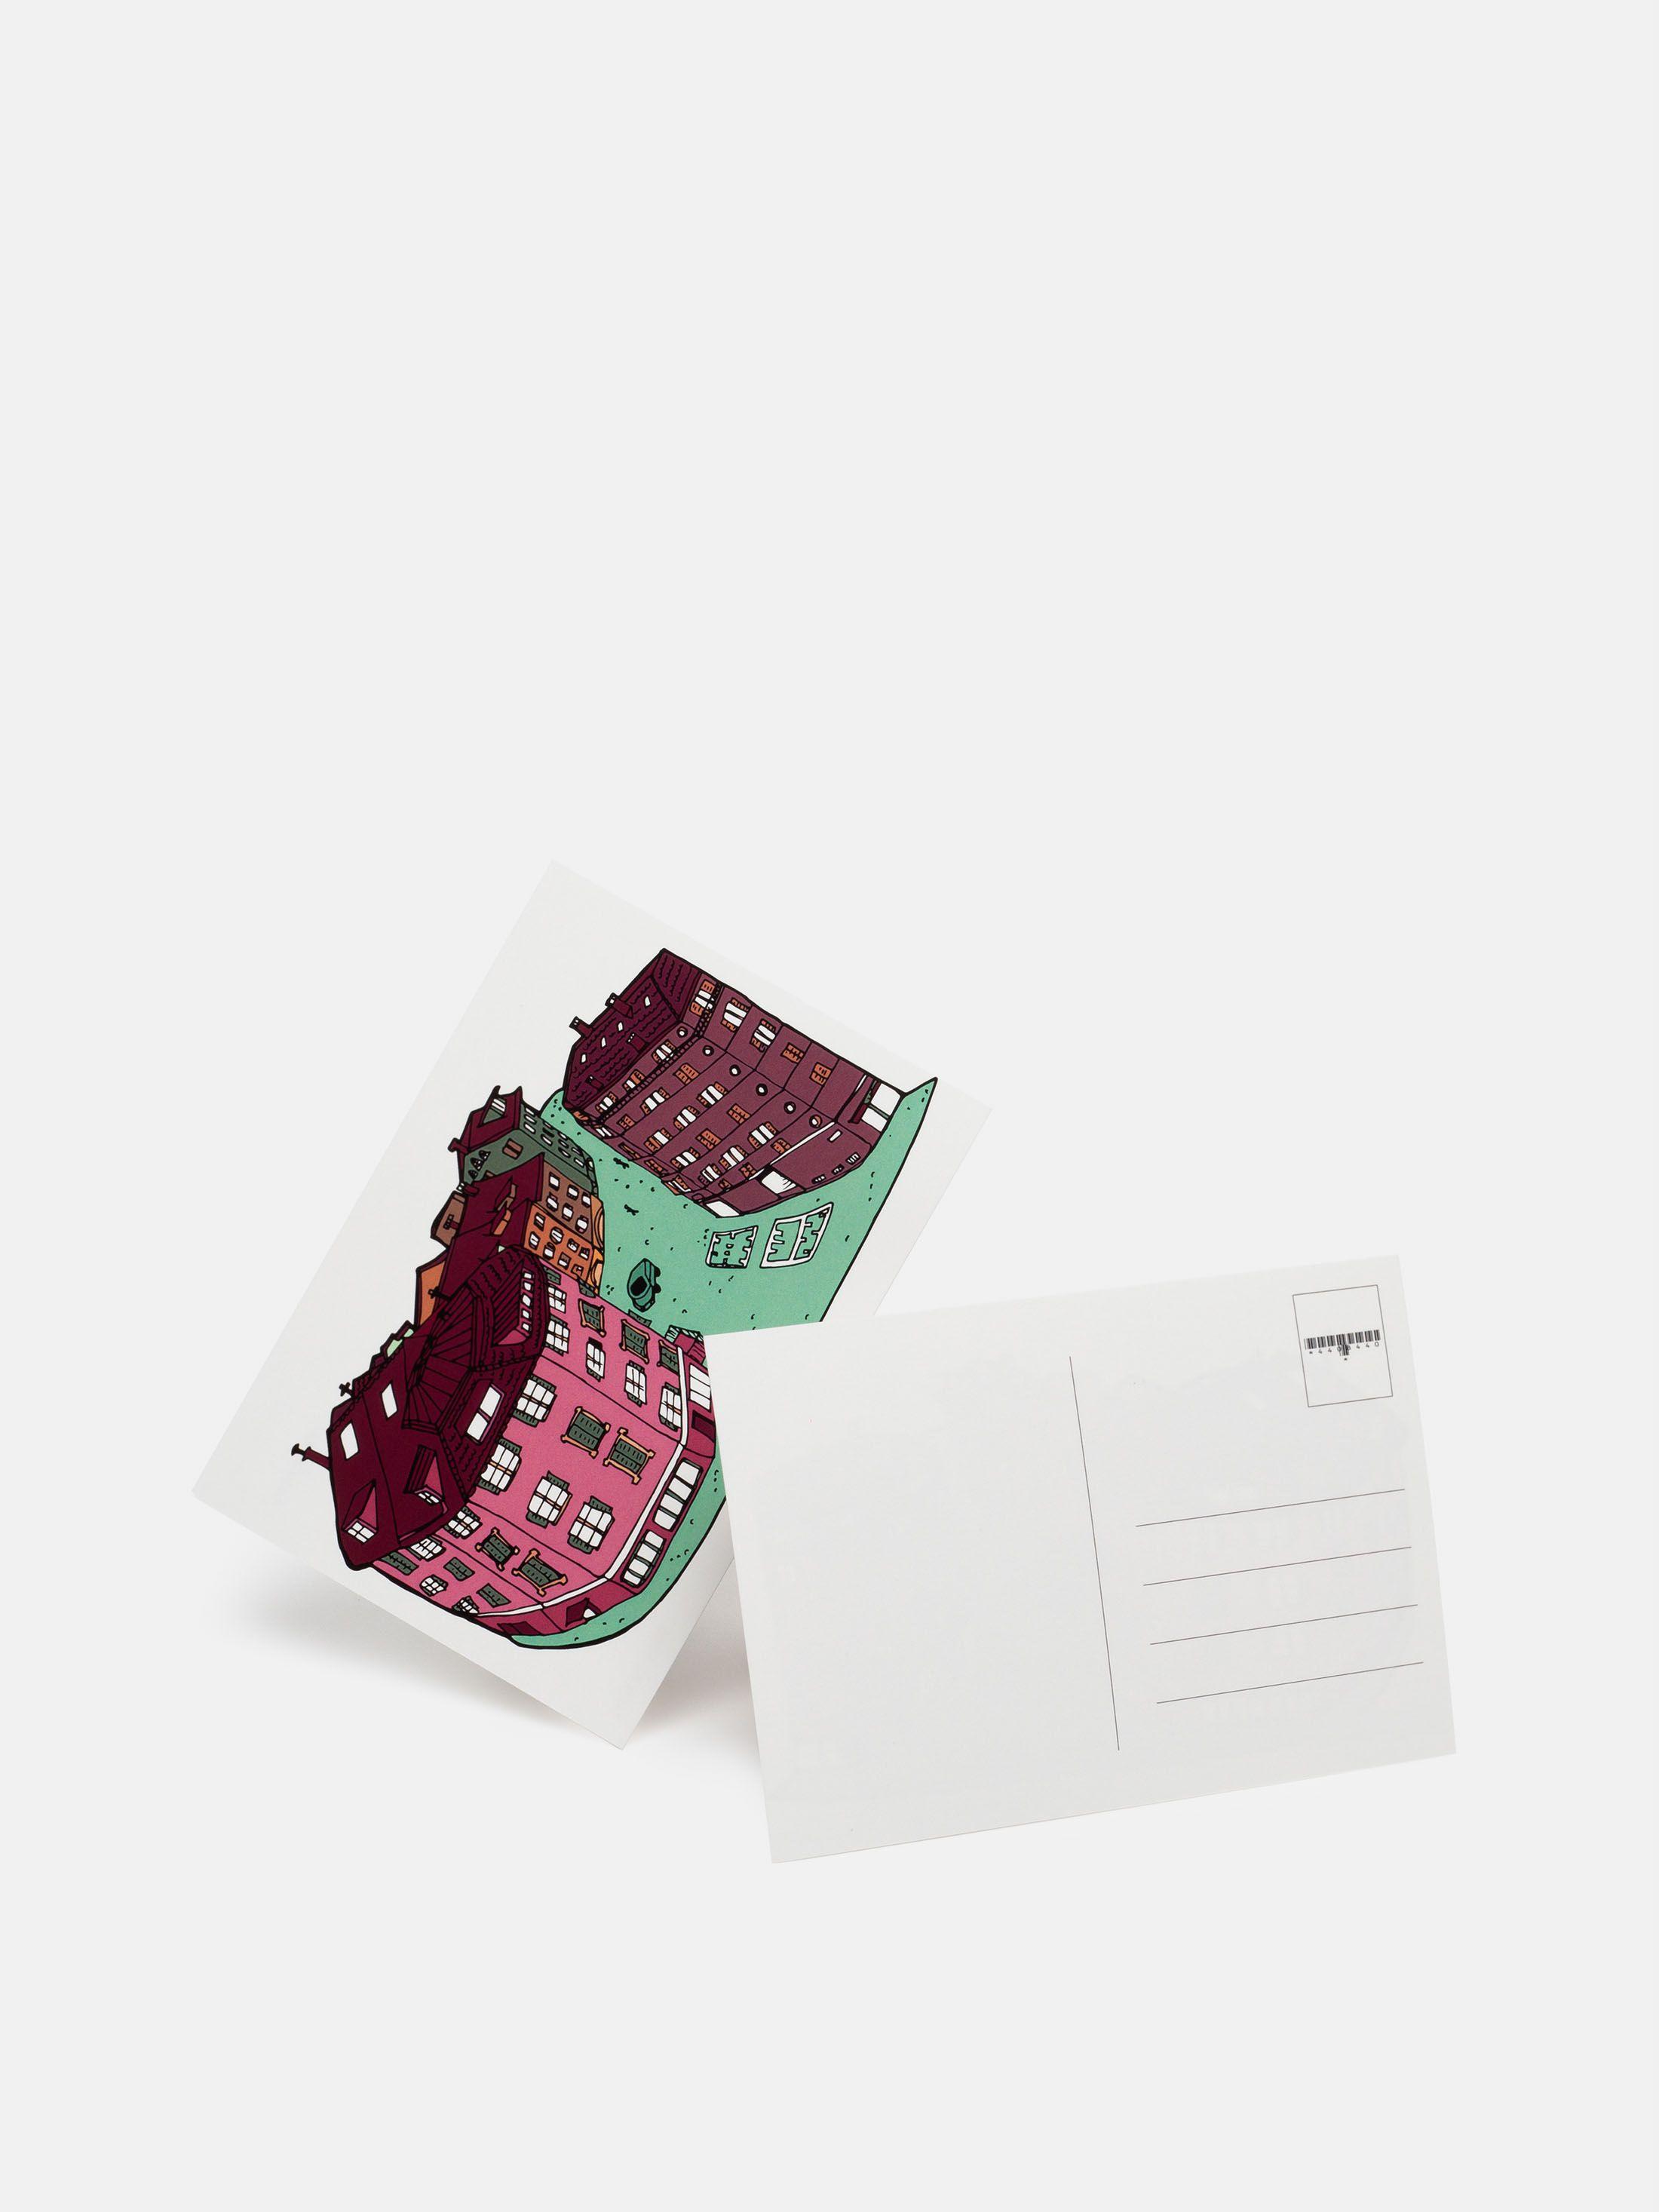 Custom Postcard Printing